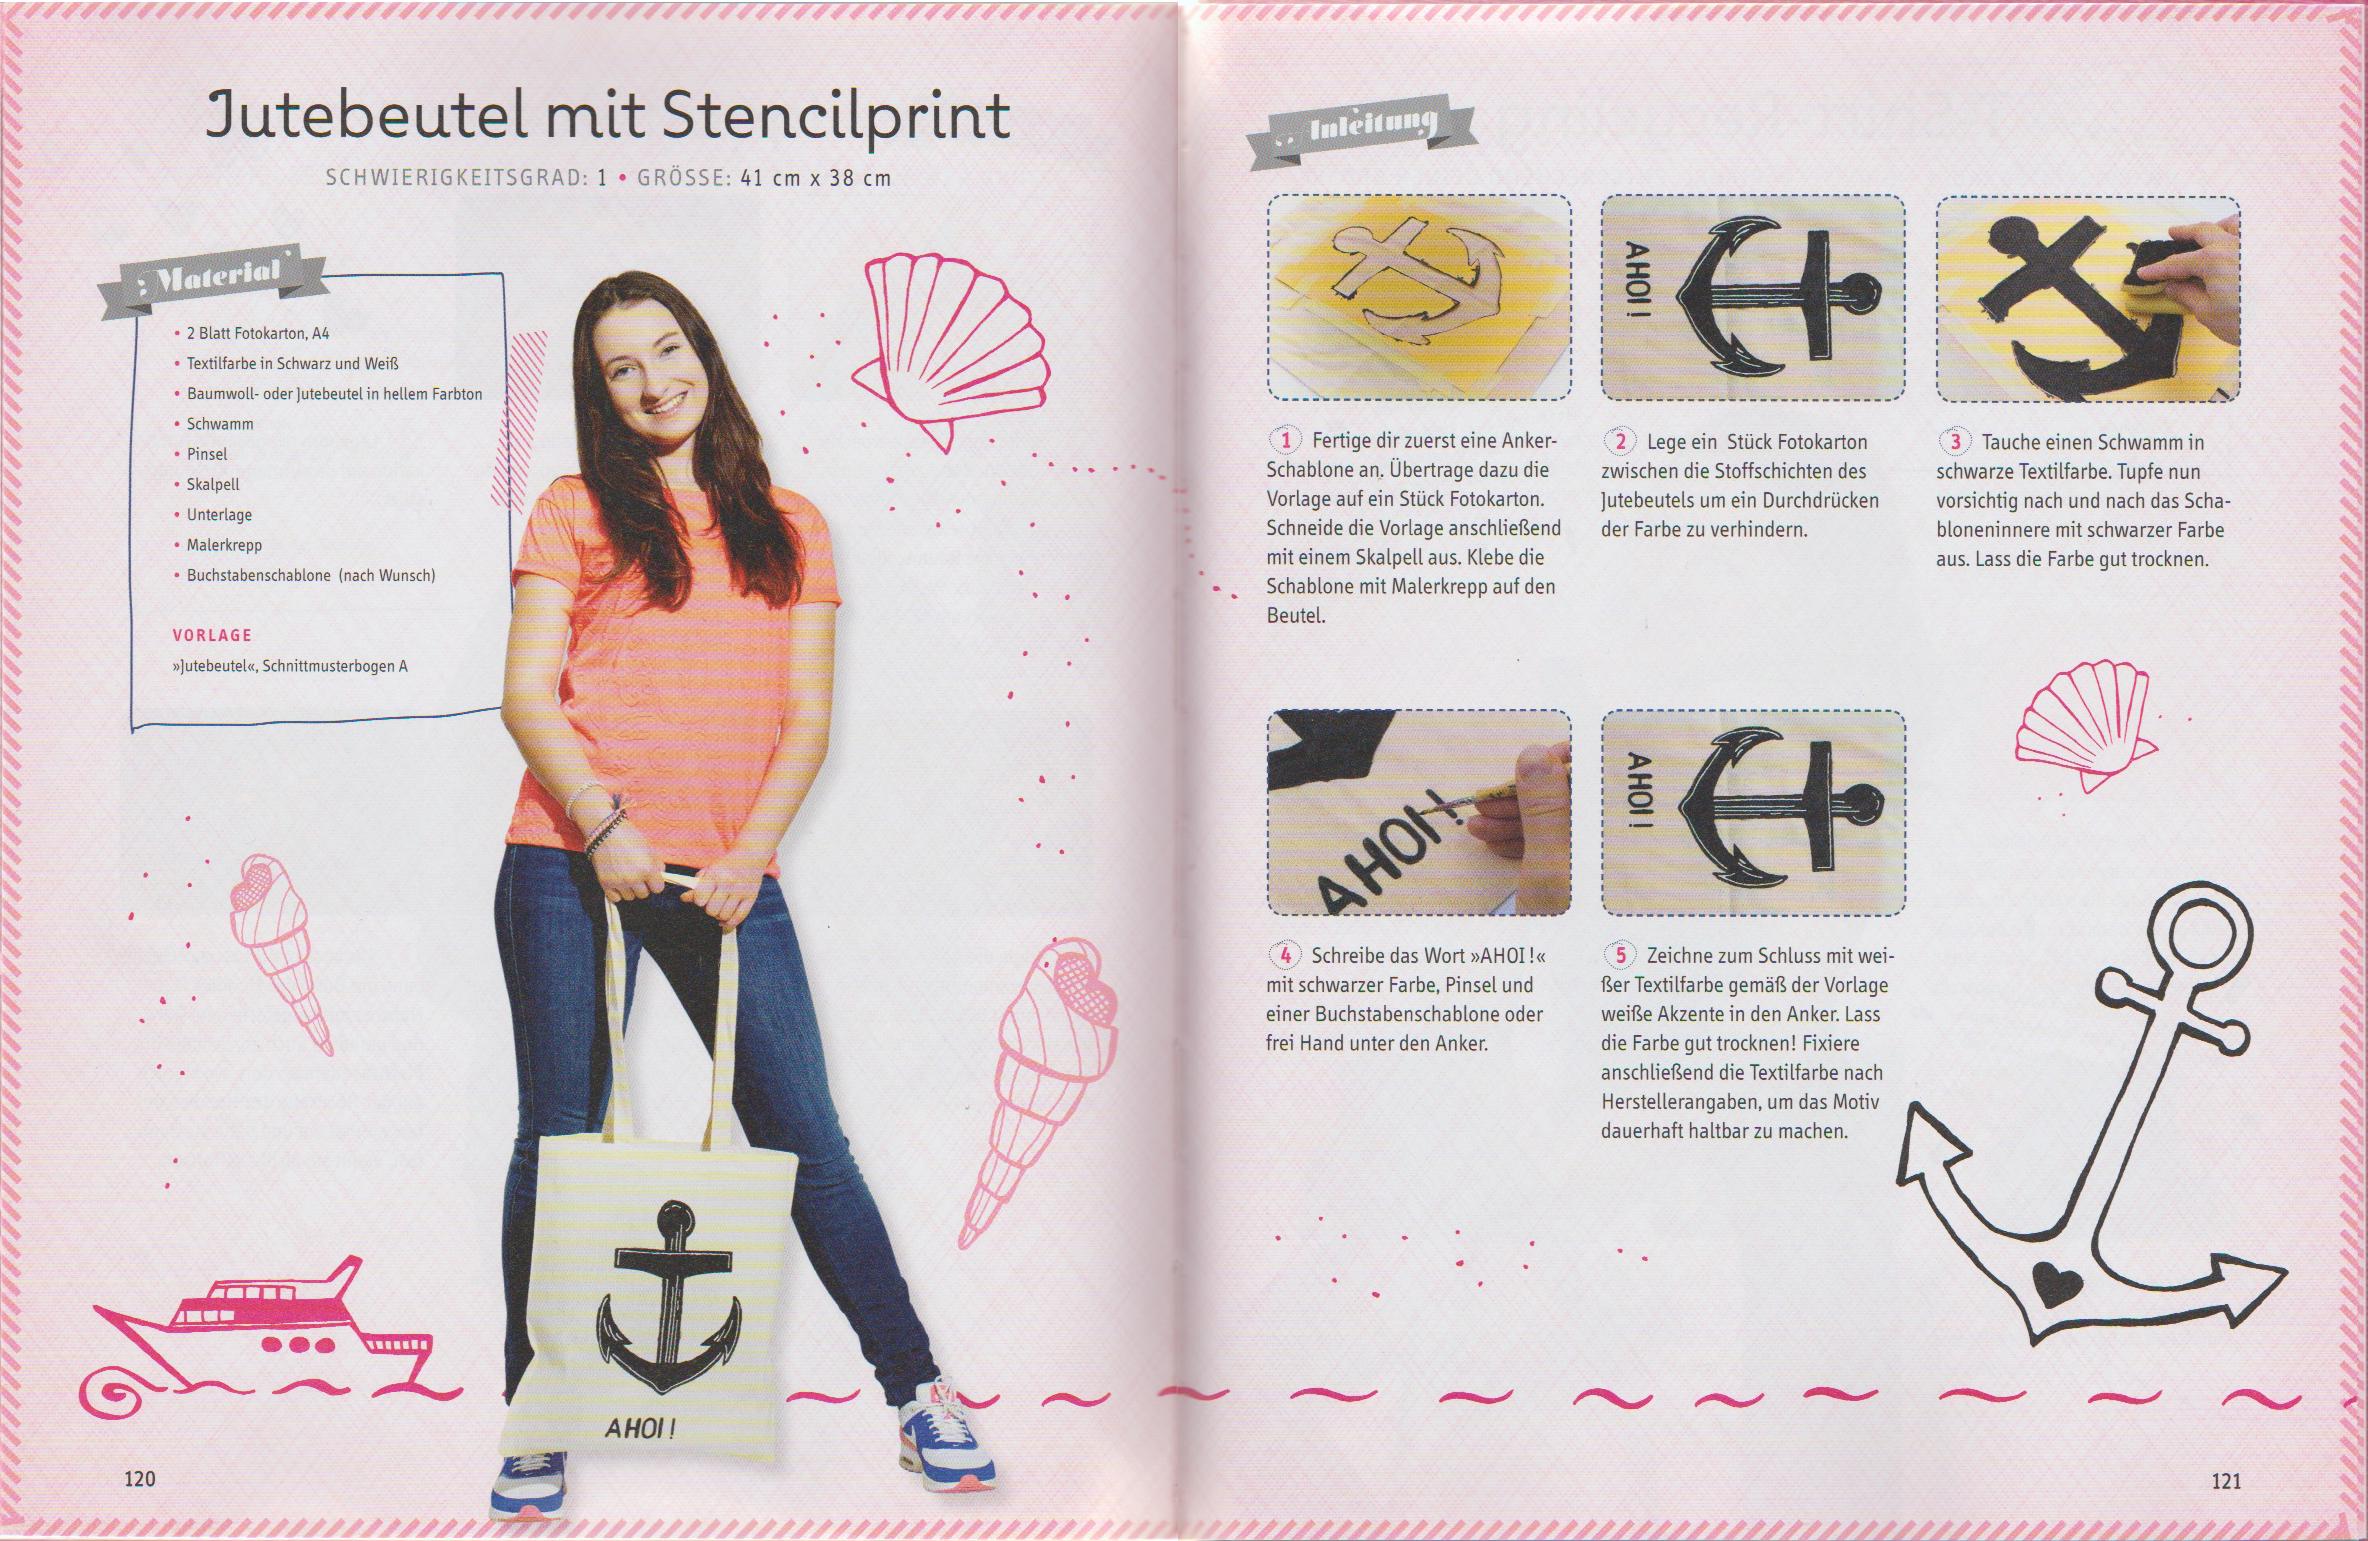 frechverlag_fashionbuch_fj15_05.jpg